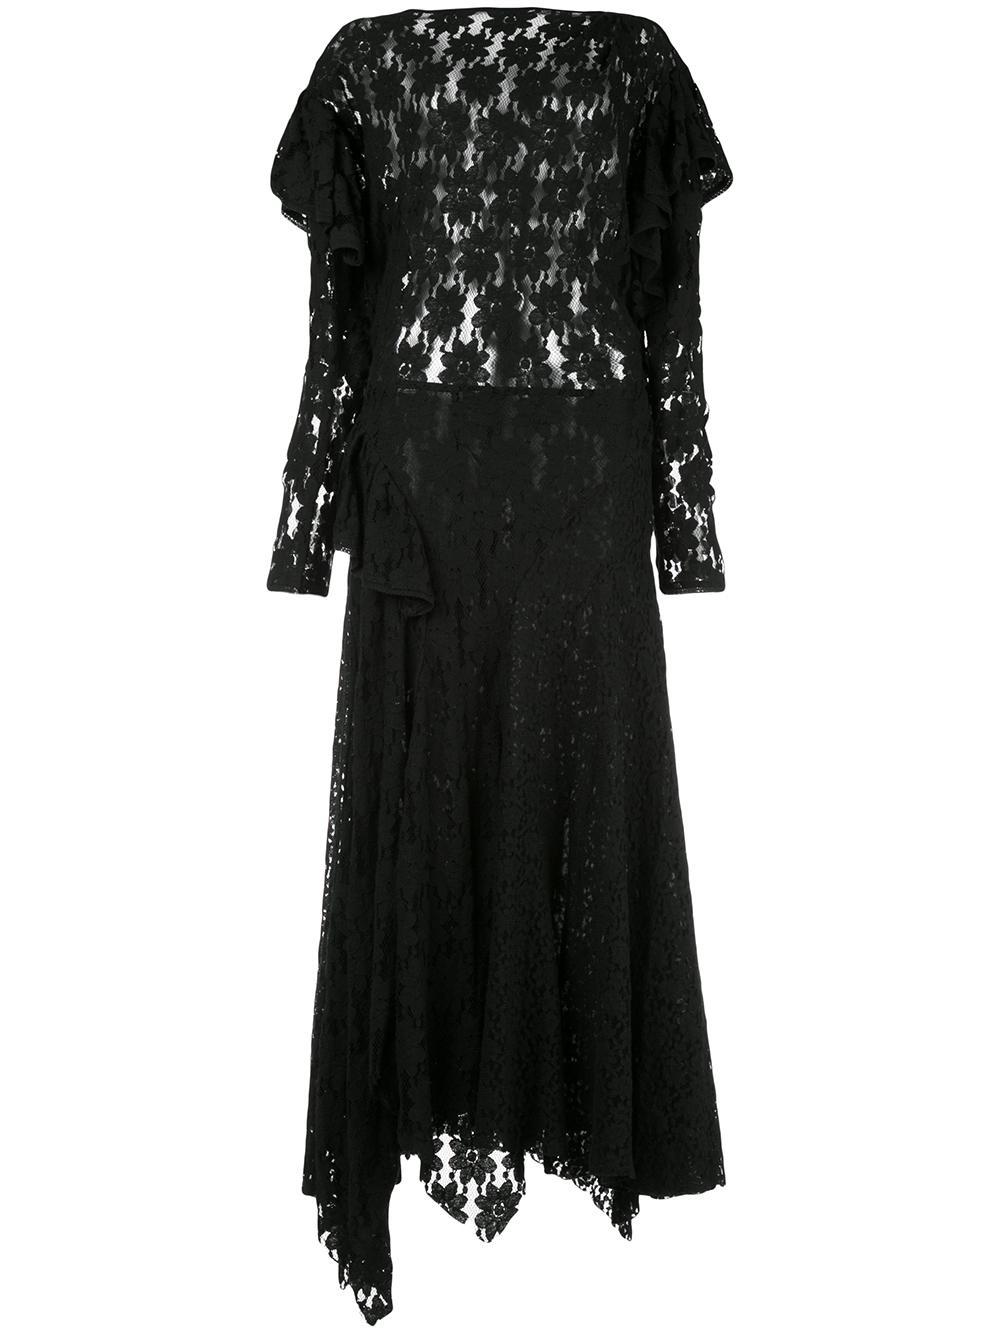 Long Sleeve Draped Lace Dress Item # VALLY